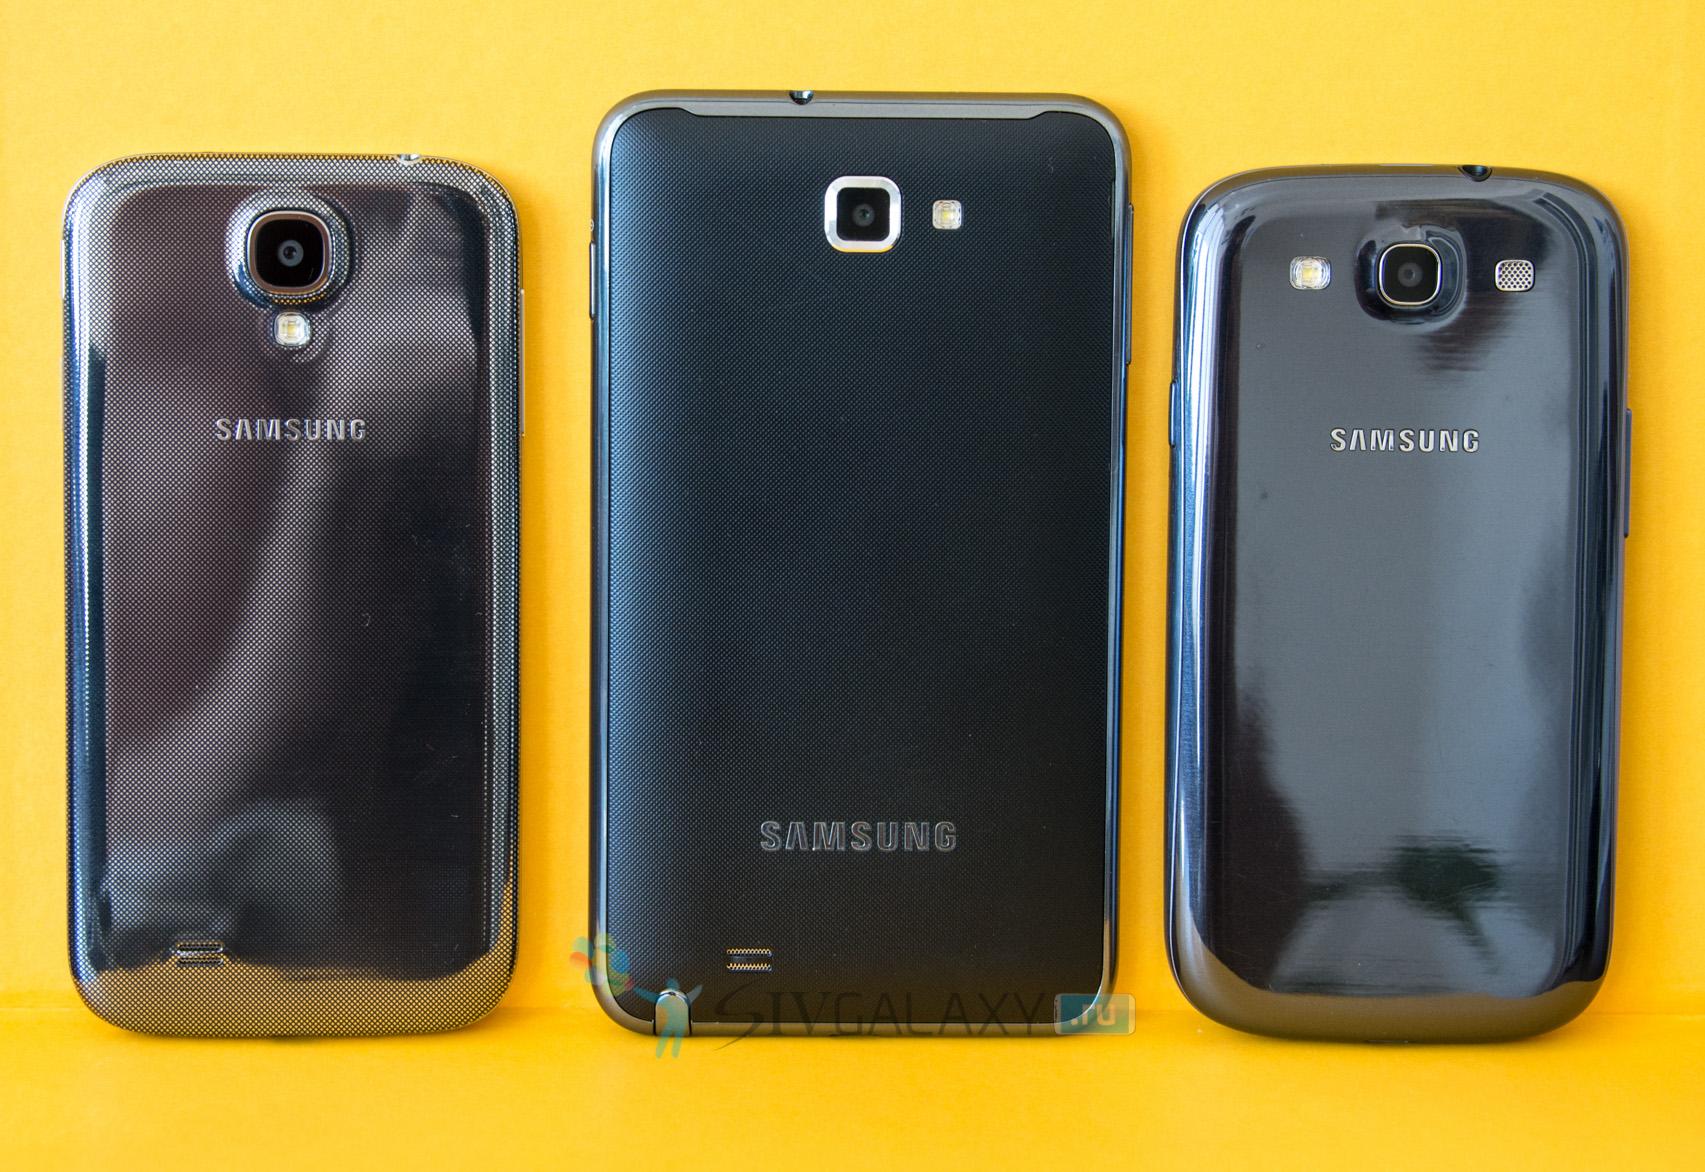 Сравнение Galaxy Note с Galaxy S4 и S3